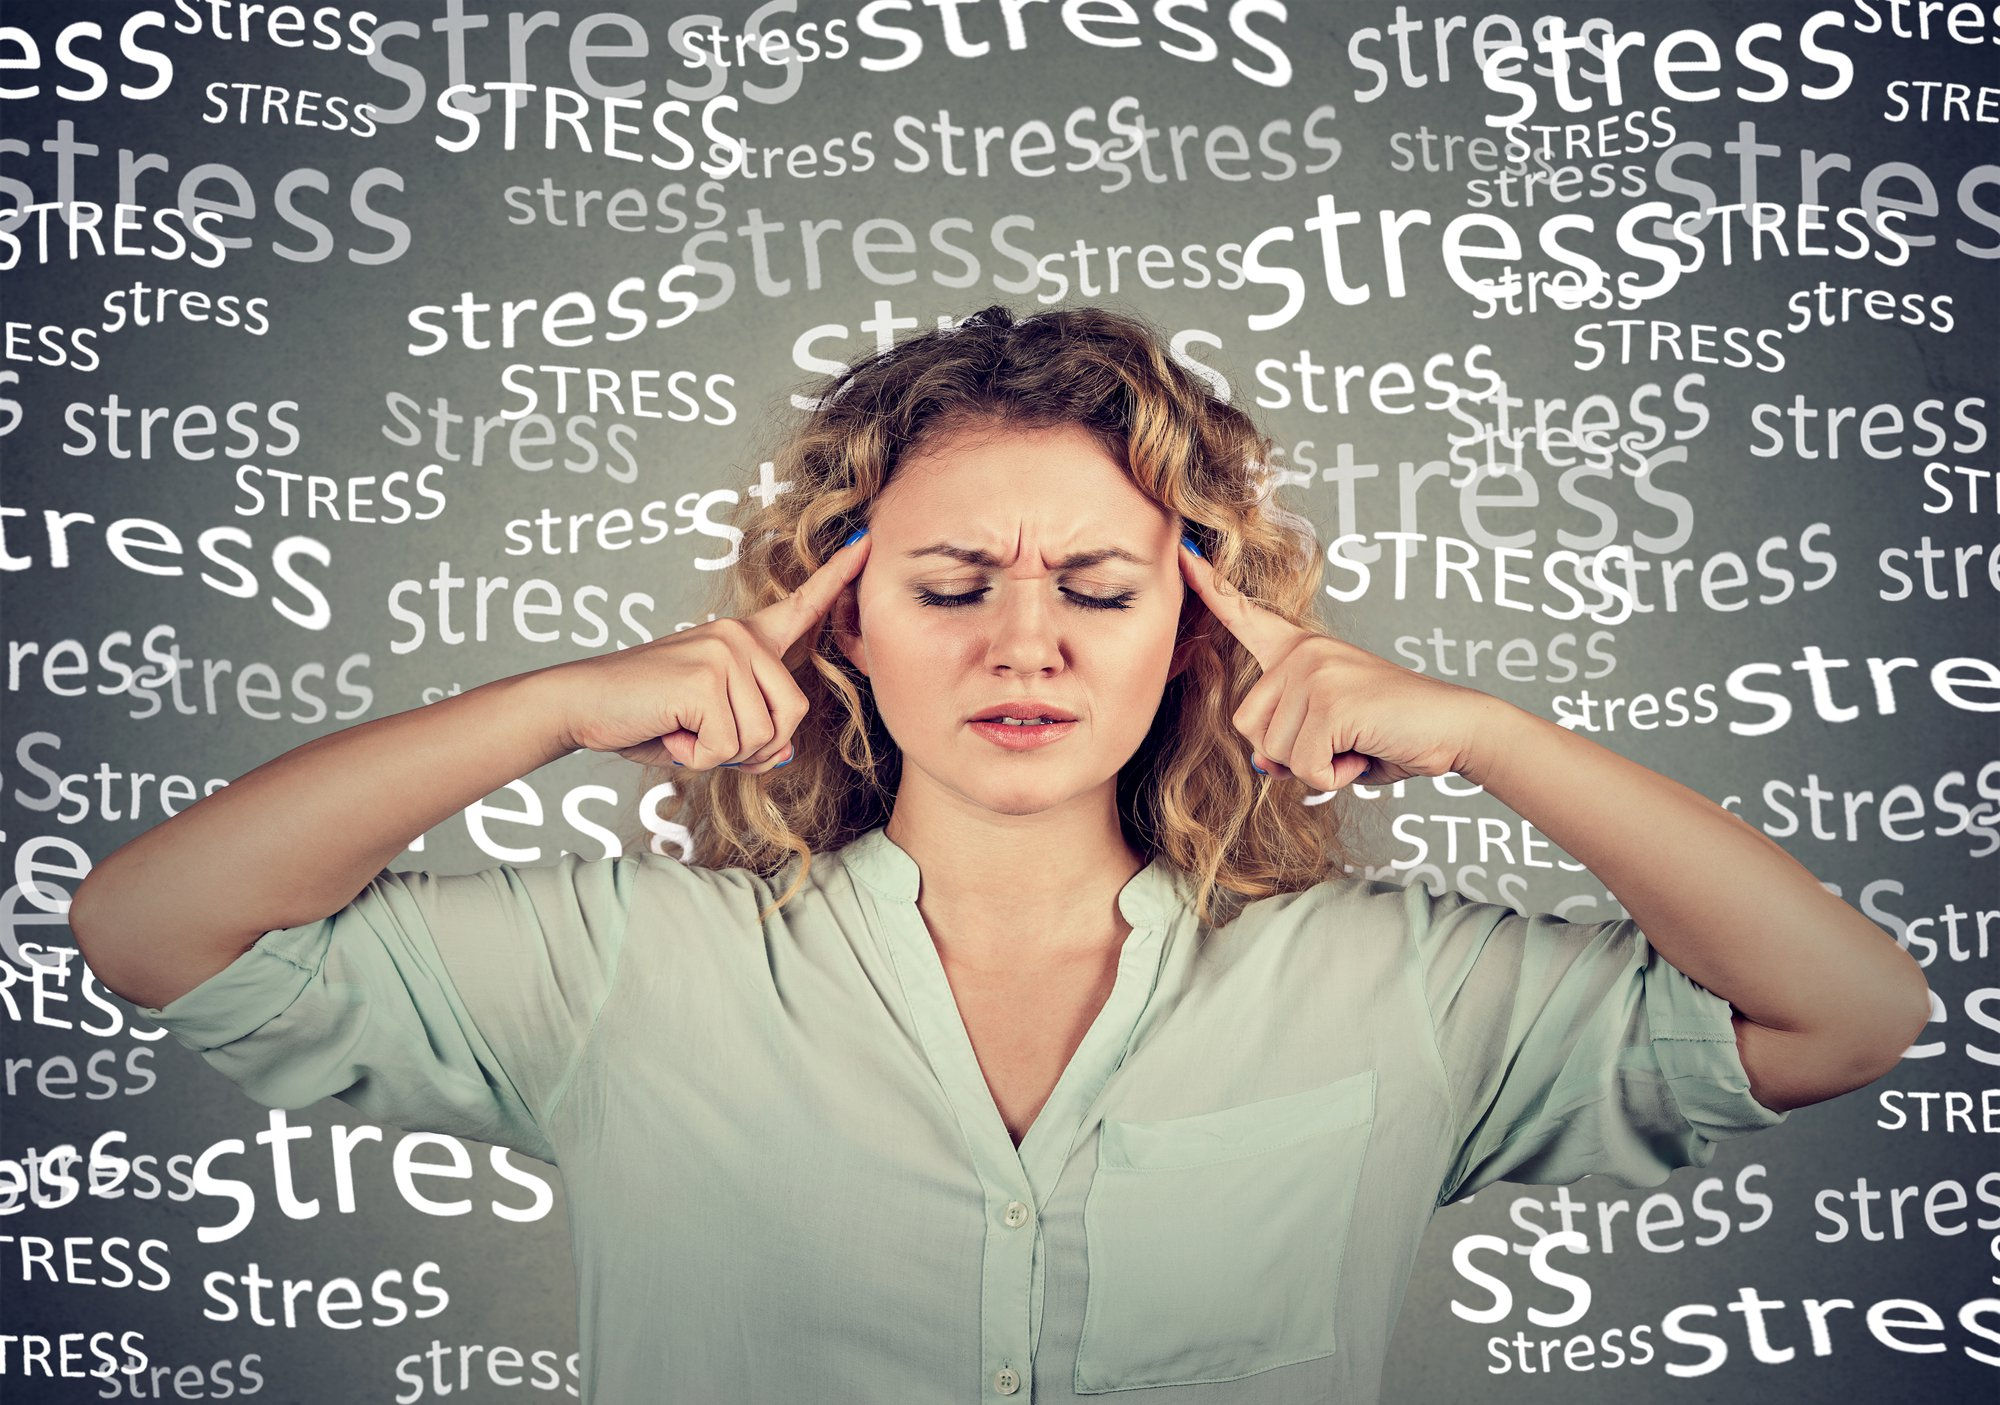 10 stappen om te ontstressen